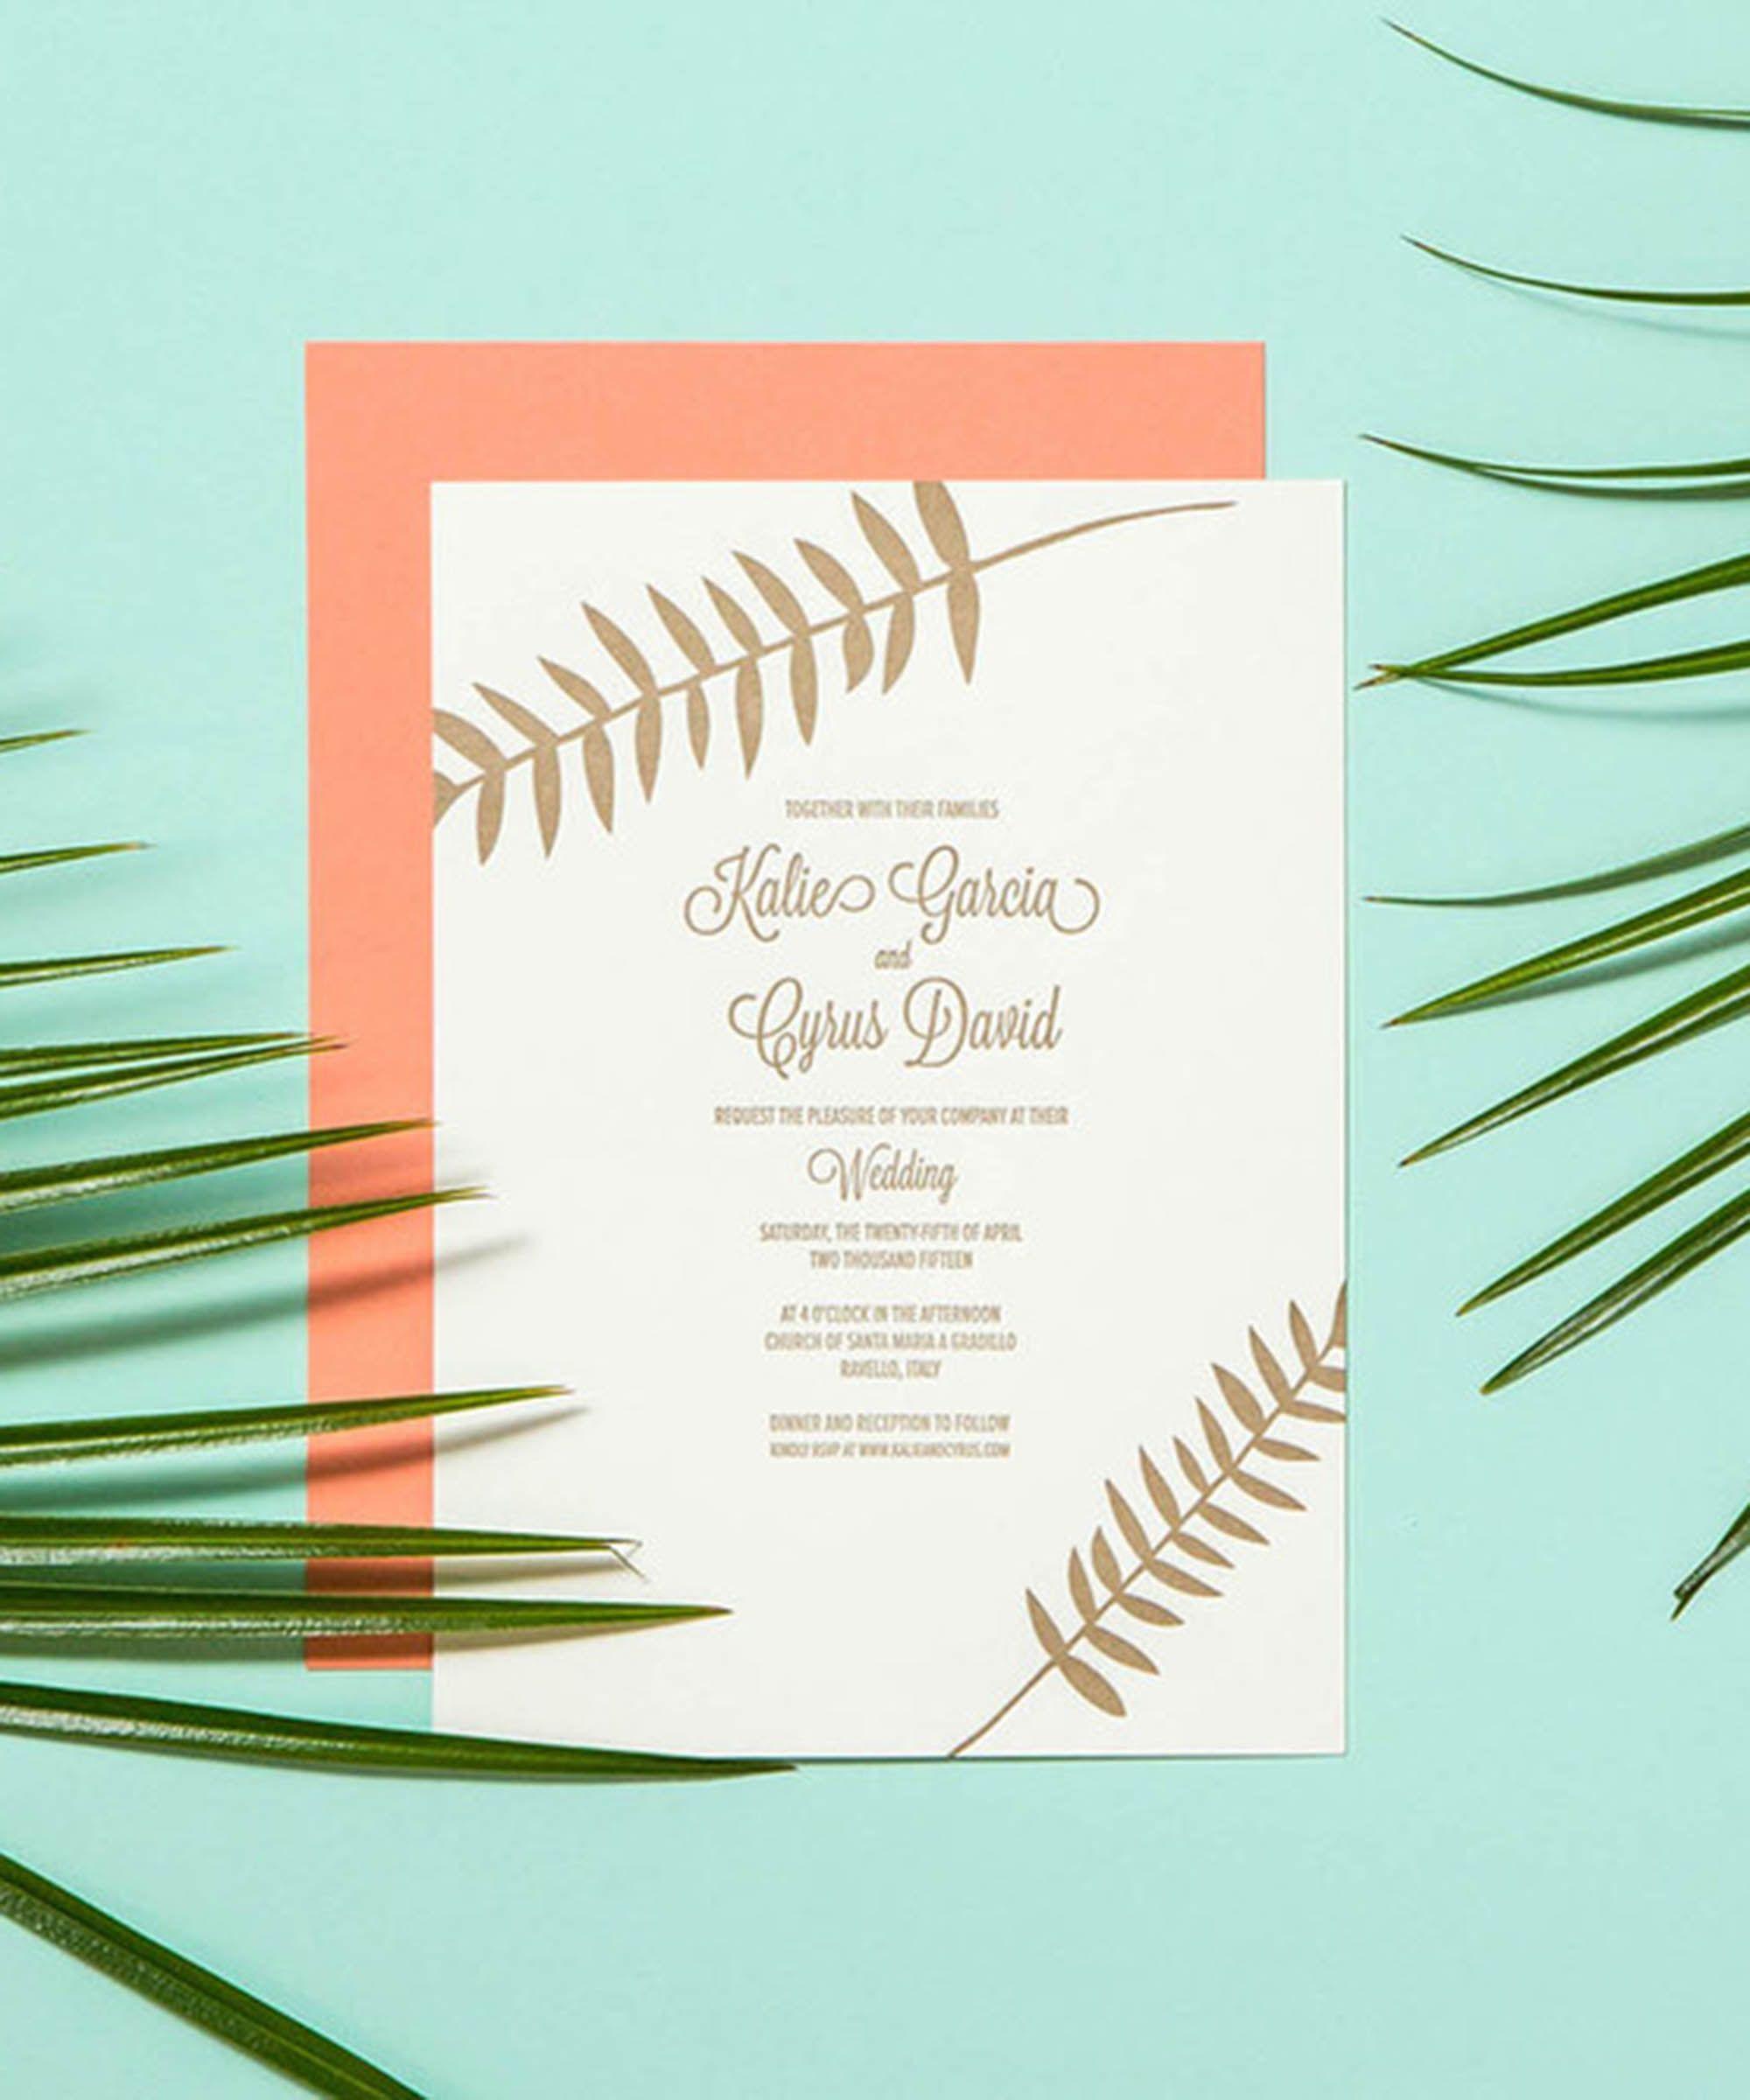 36 Stunning Wedding-Invitation Ideas   Wedding invitation cards ...